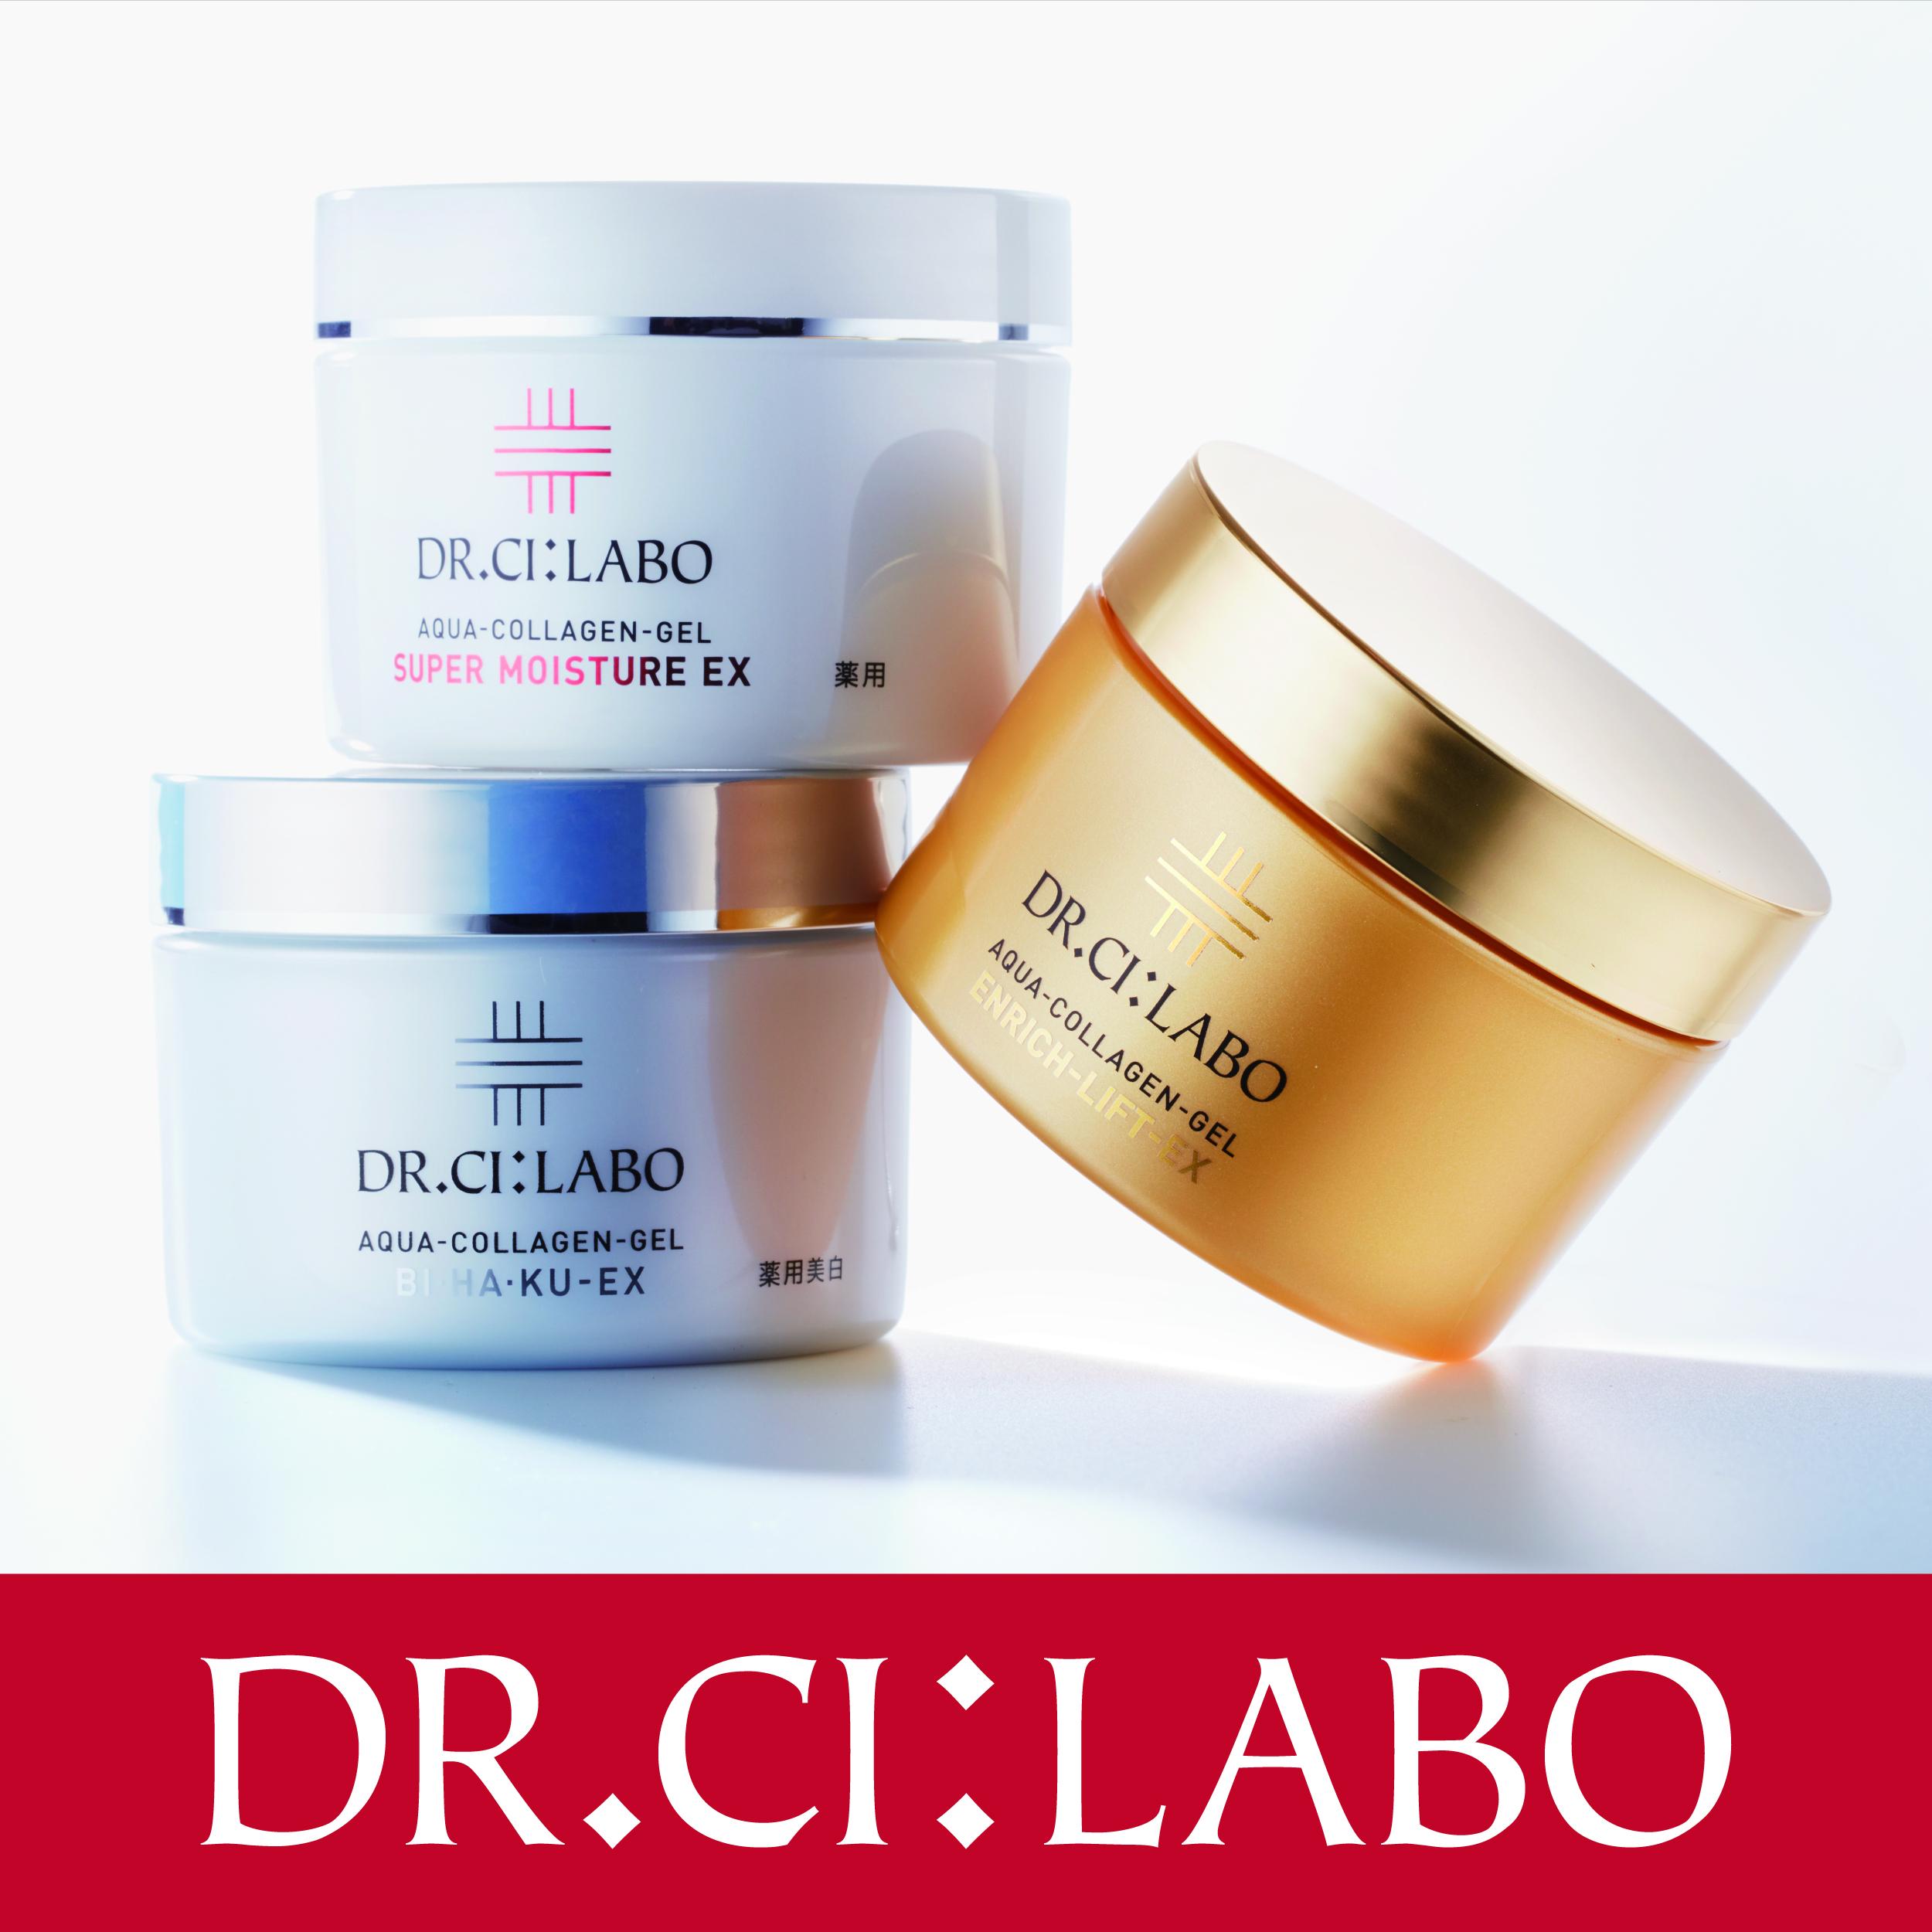 Dr.ci-labo